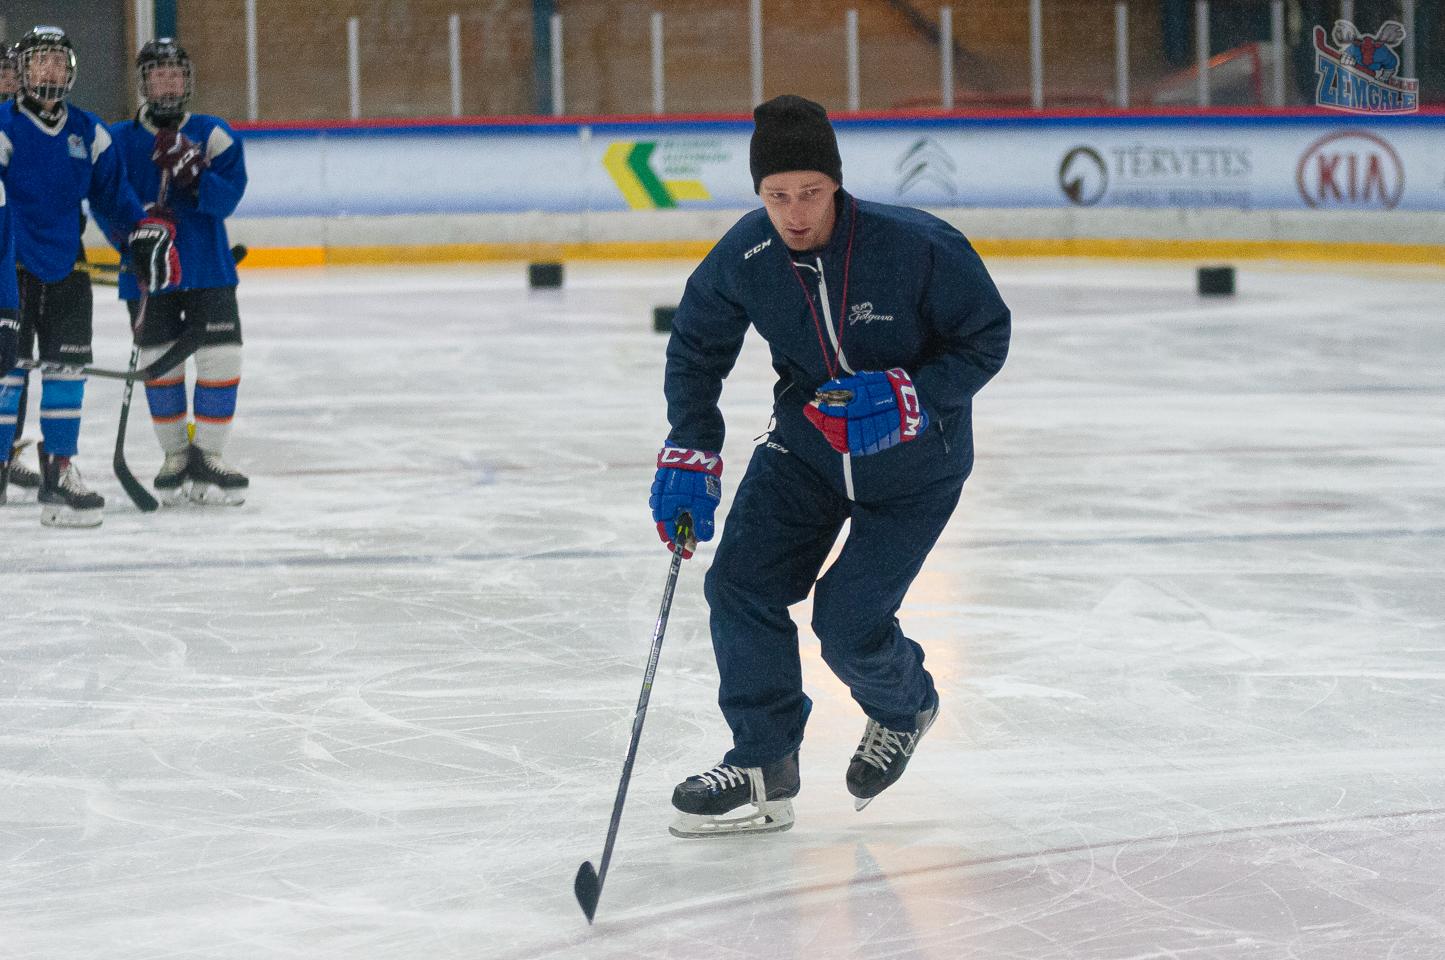 Jelgavas ledus sporta skolas U15 vecuma grupas audzēkņi aizvada treniņu Jelgavas ledus hallē Rihards Cimermanis